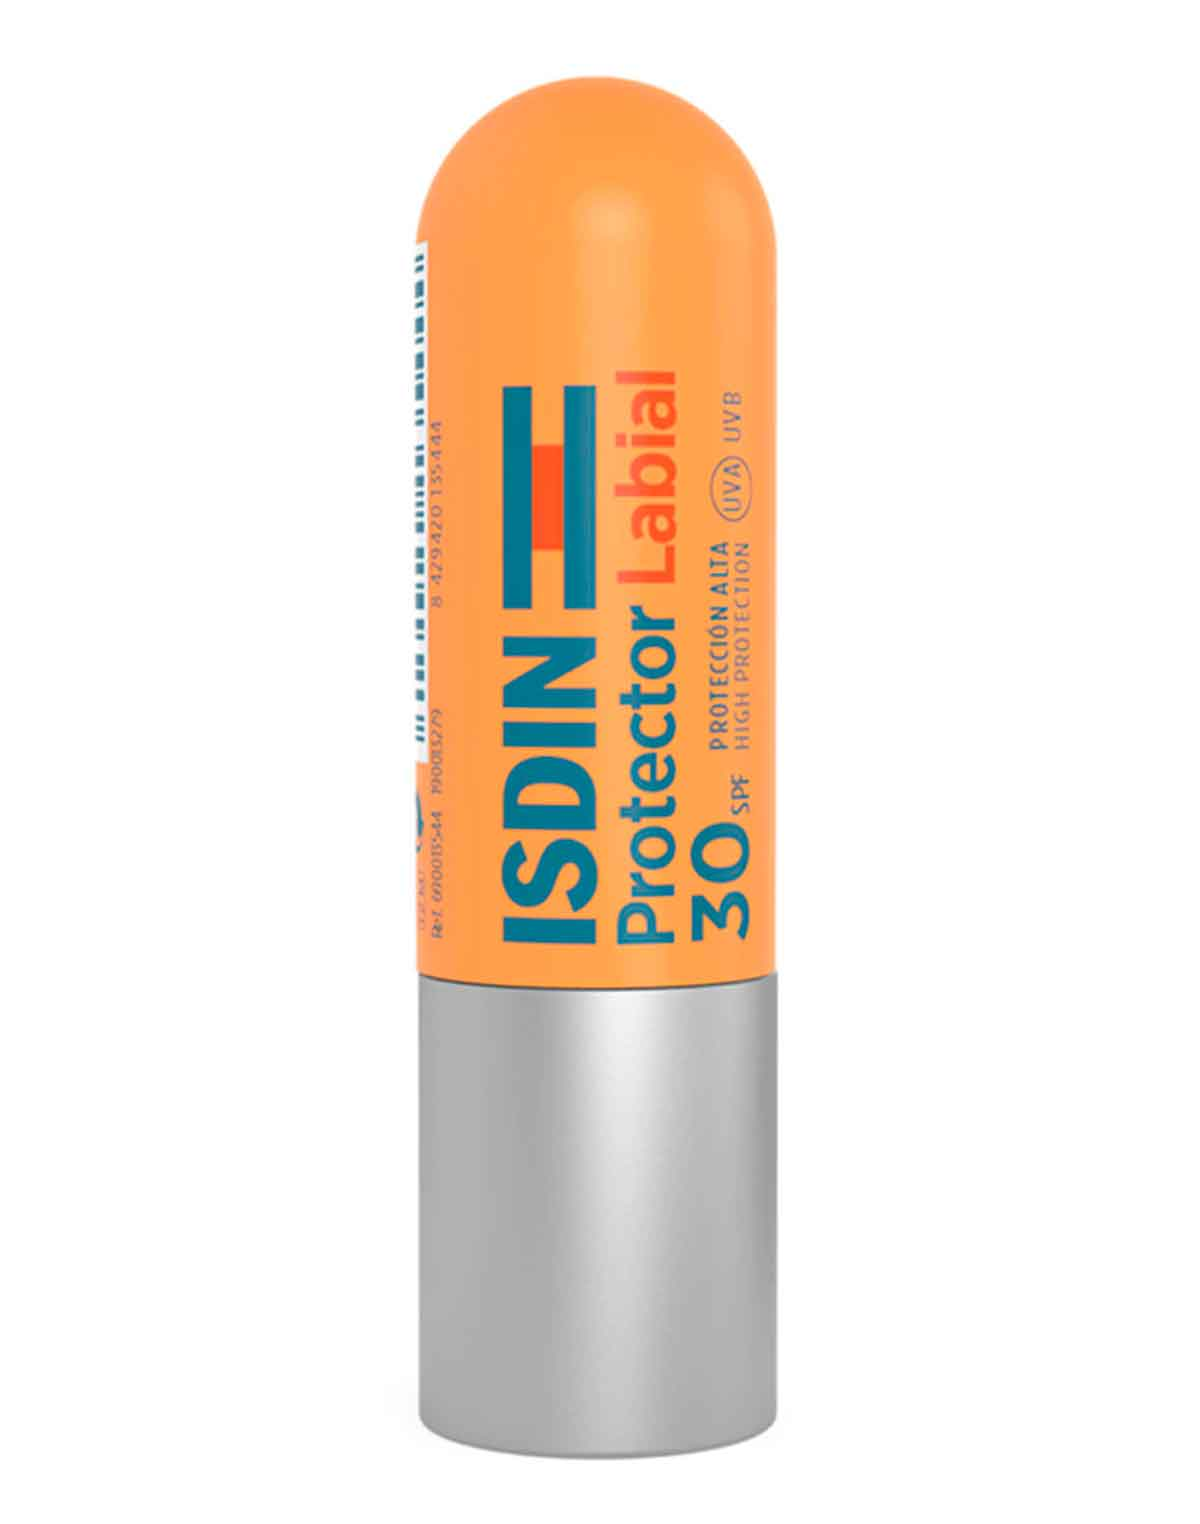 Protector Labial SPF30 Isdin 6,75